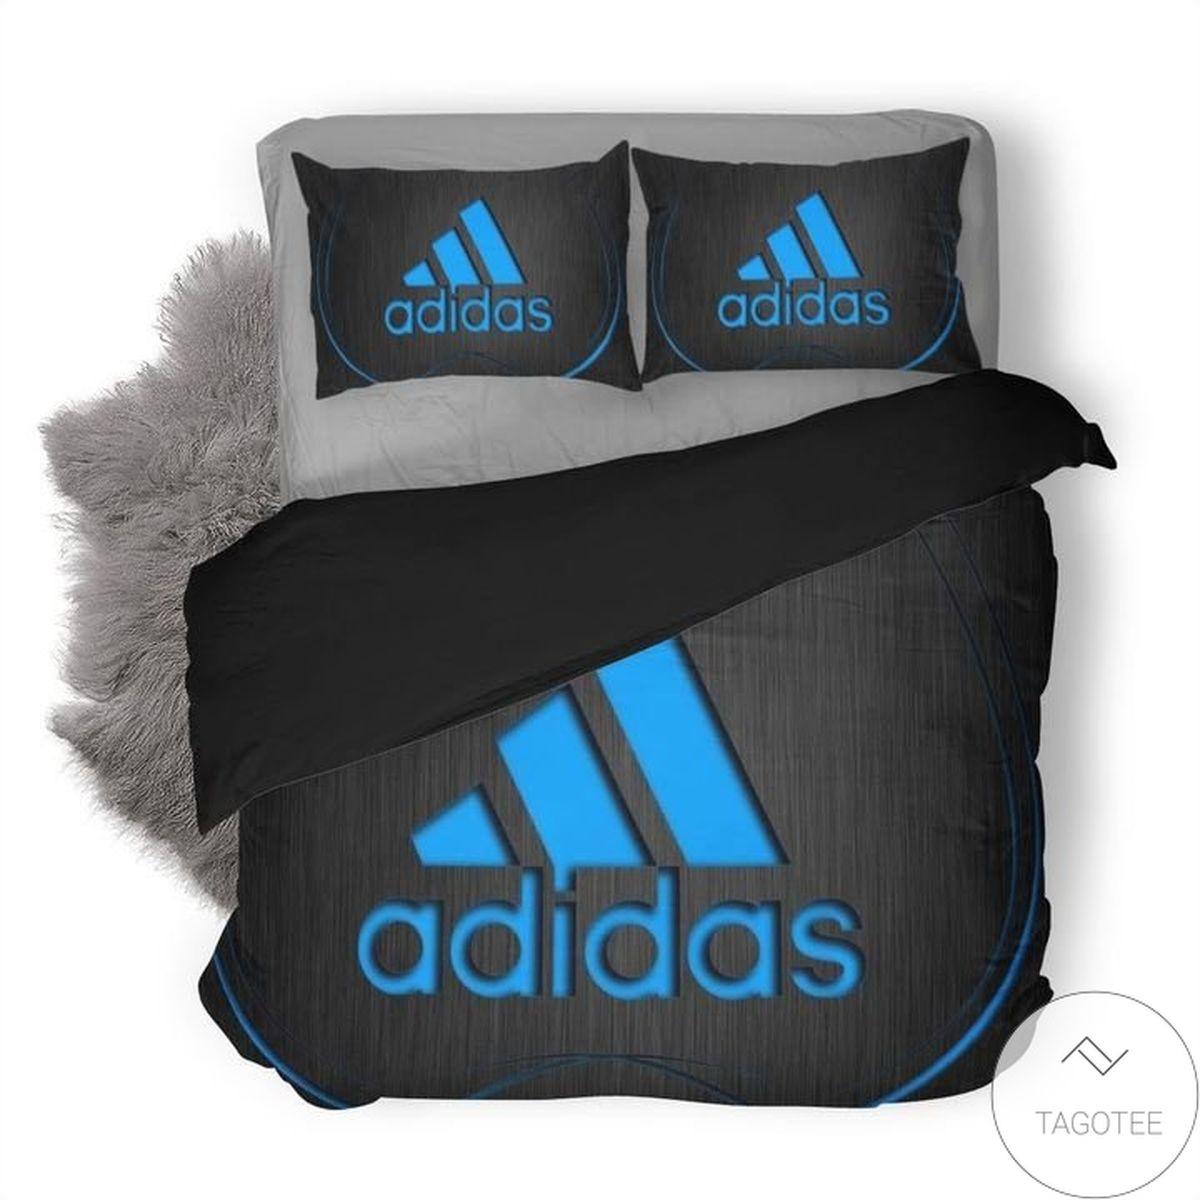 Adidas Logo Bedding Set